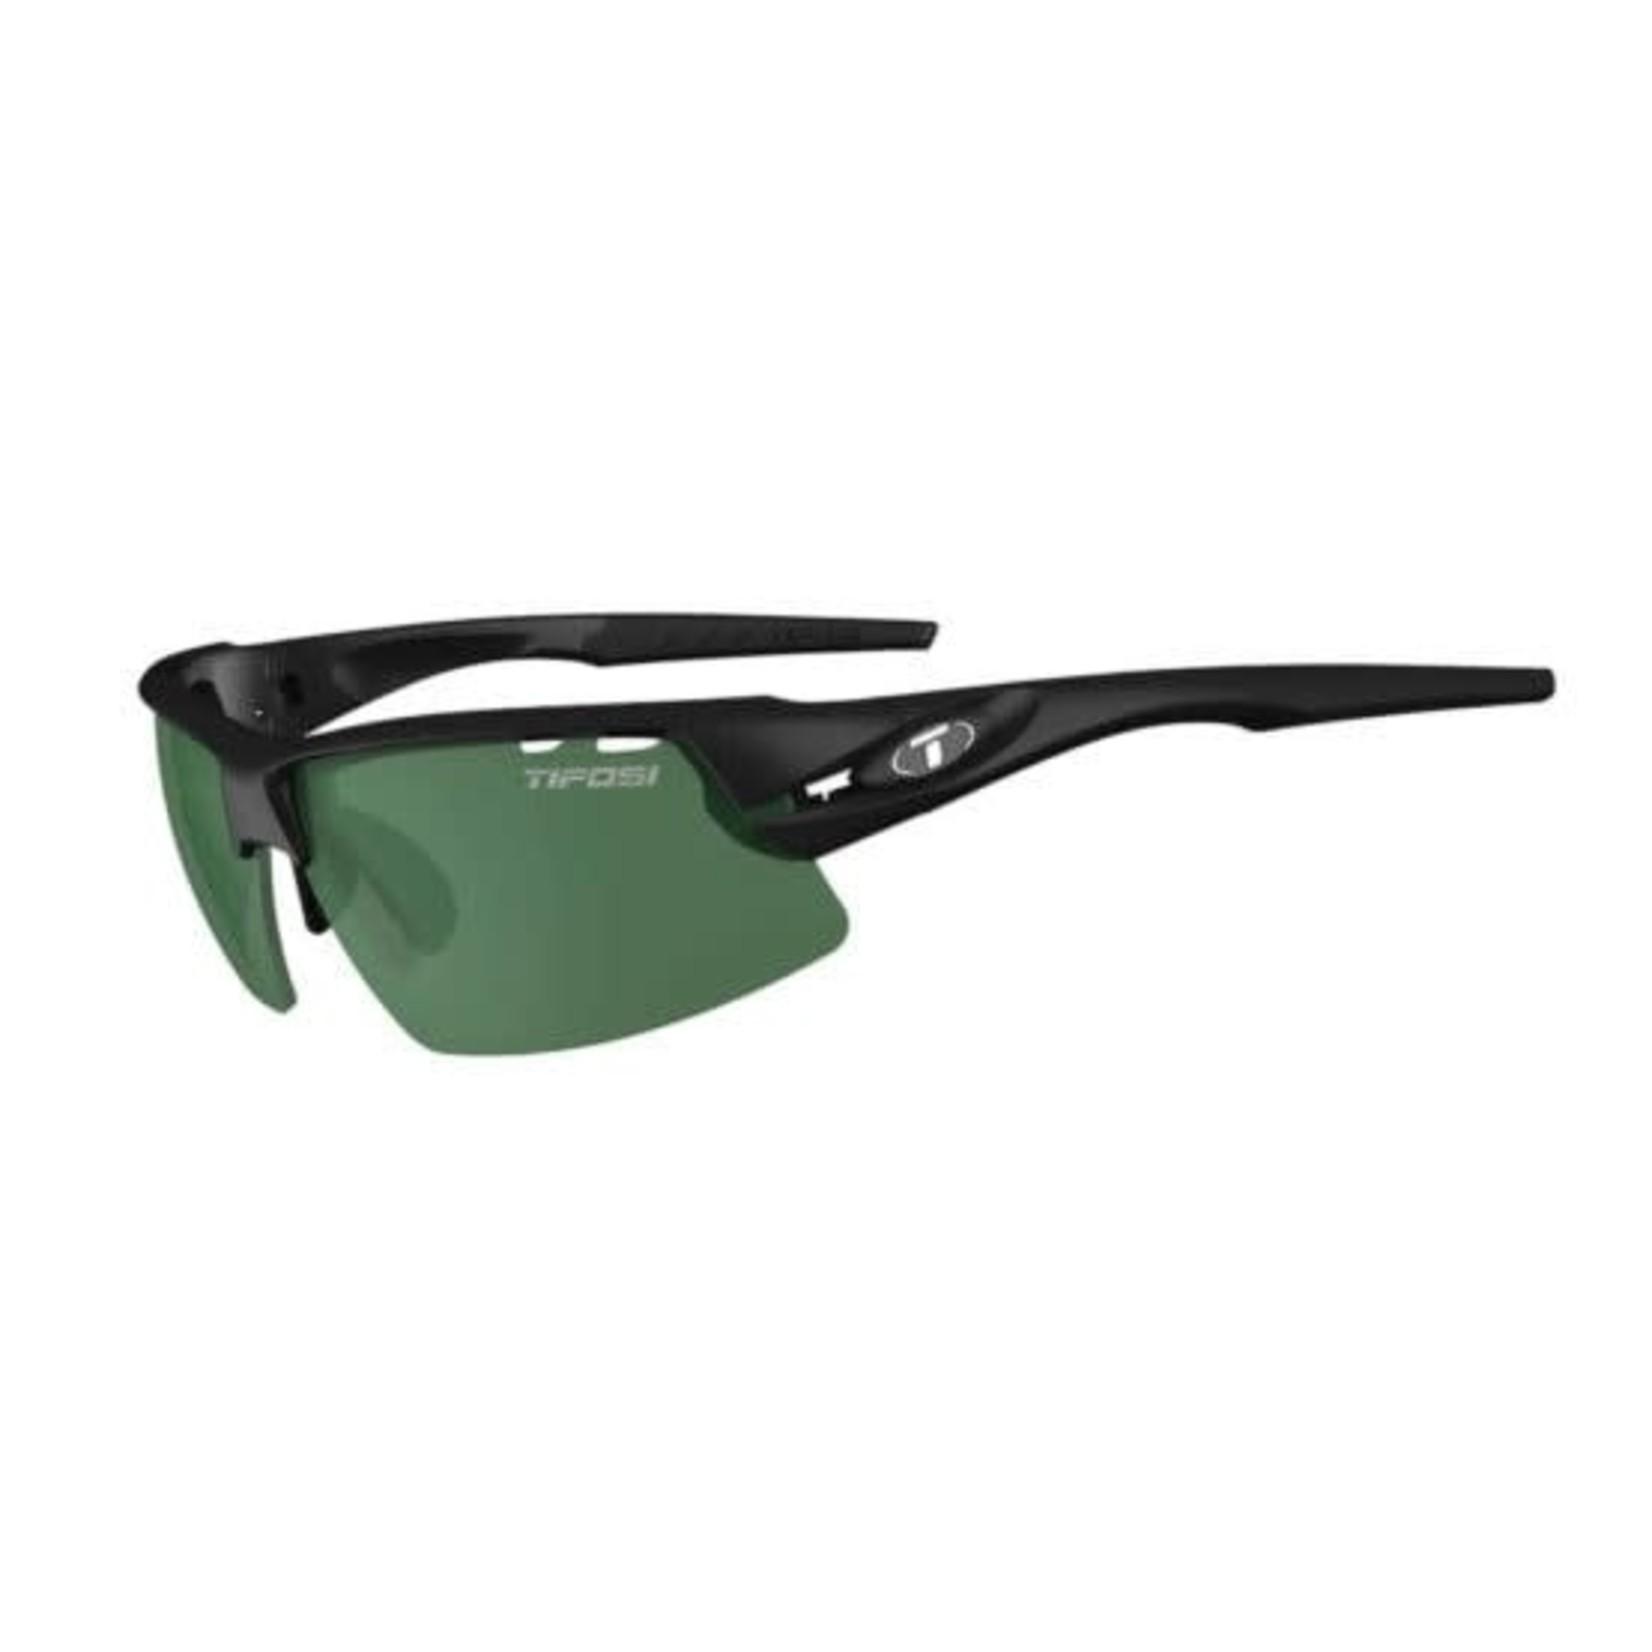 Tifosi Optics Crit, Matte Black Golf Interchangeable Sunglasses